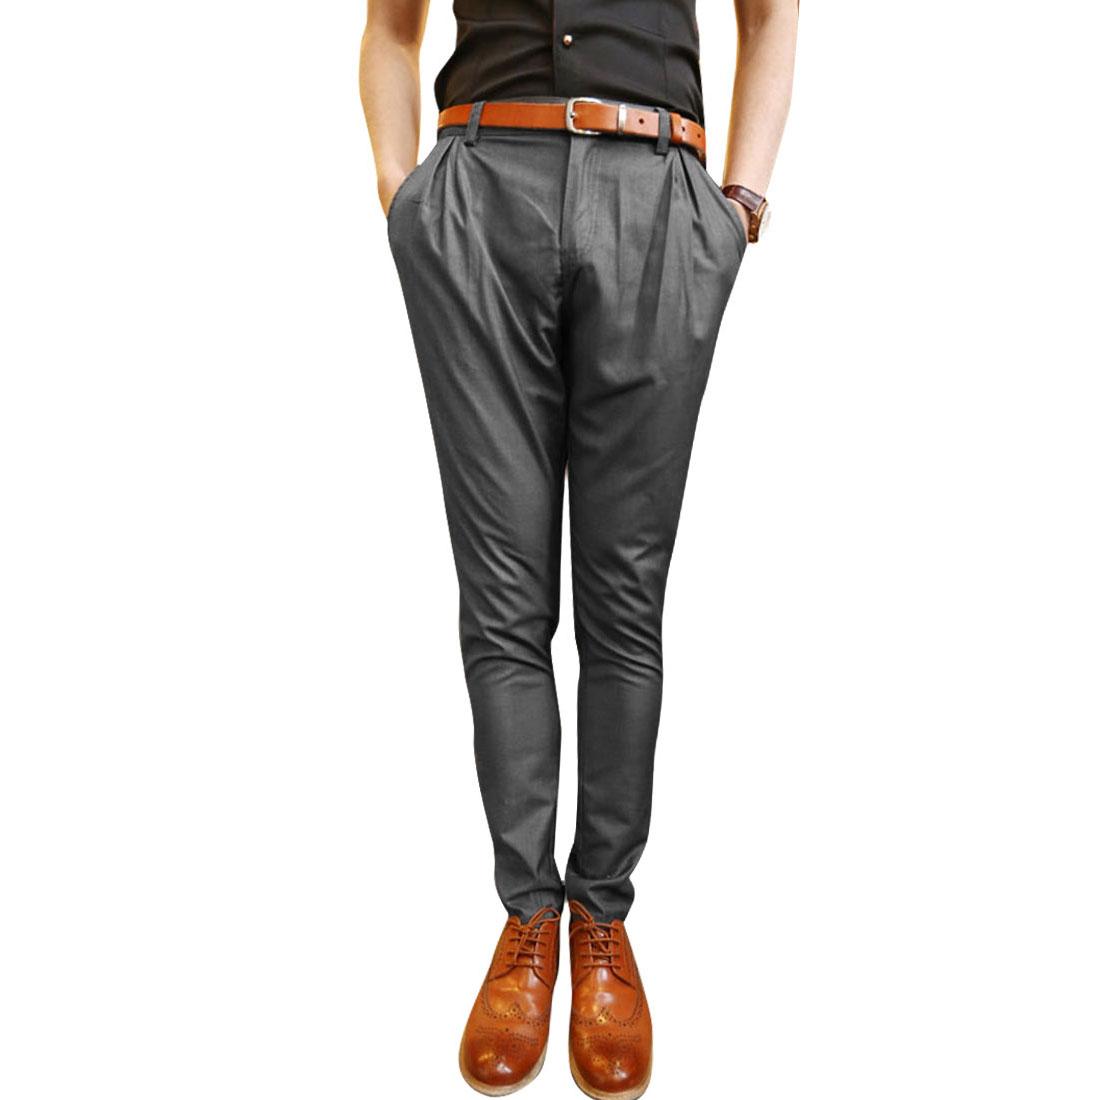 Men Front Button Closure Hidden Zipper Slant Pockets Pants Grey W32